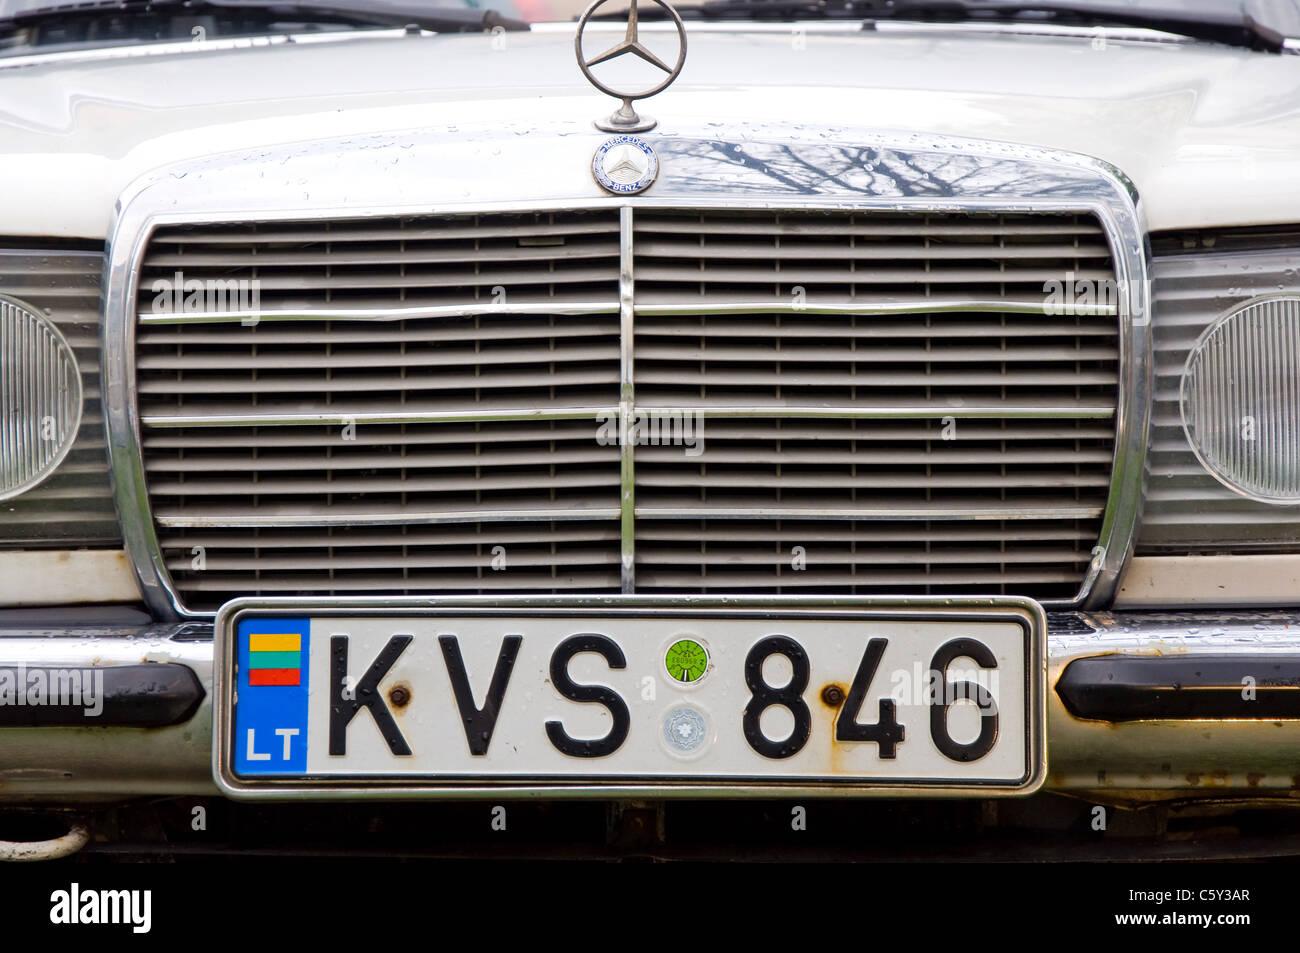 Old Mercedes Benz Stock Photos Images Alamy 230ce Fuel Filter Vilnius Lithuania Image